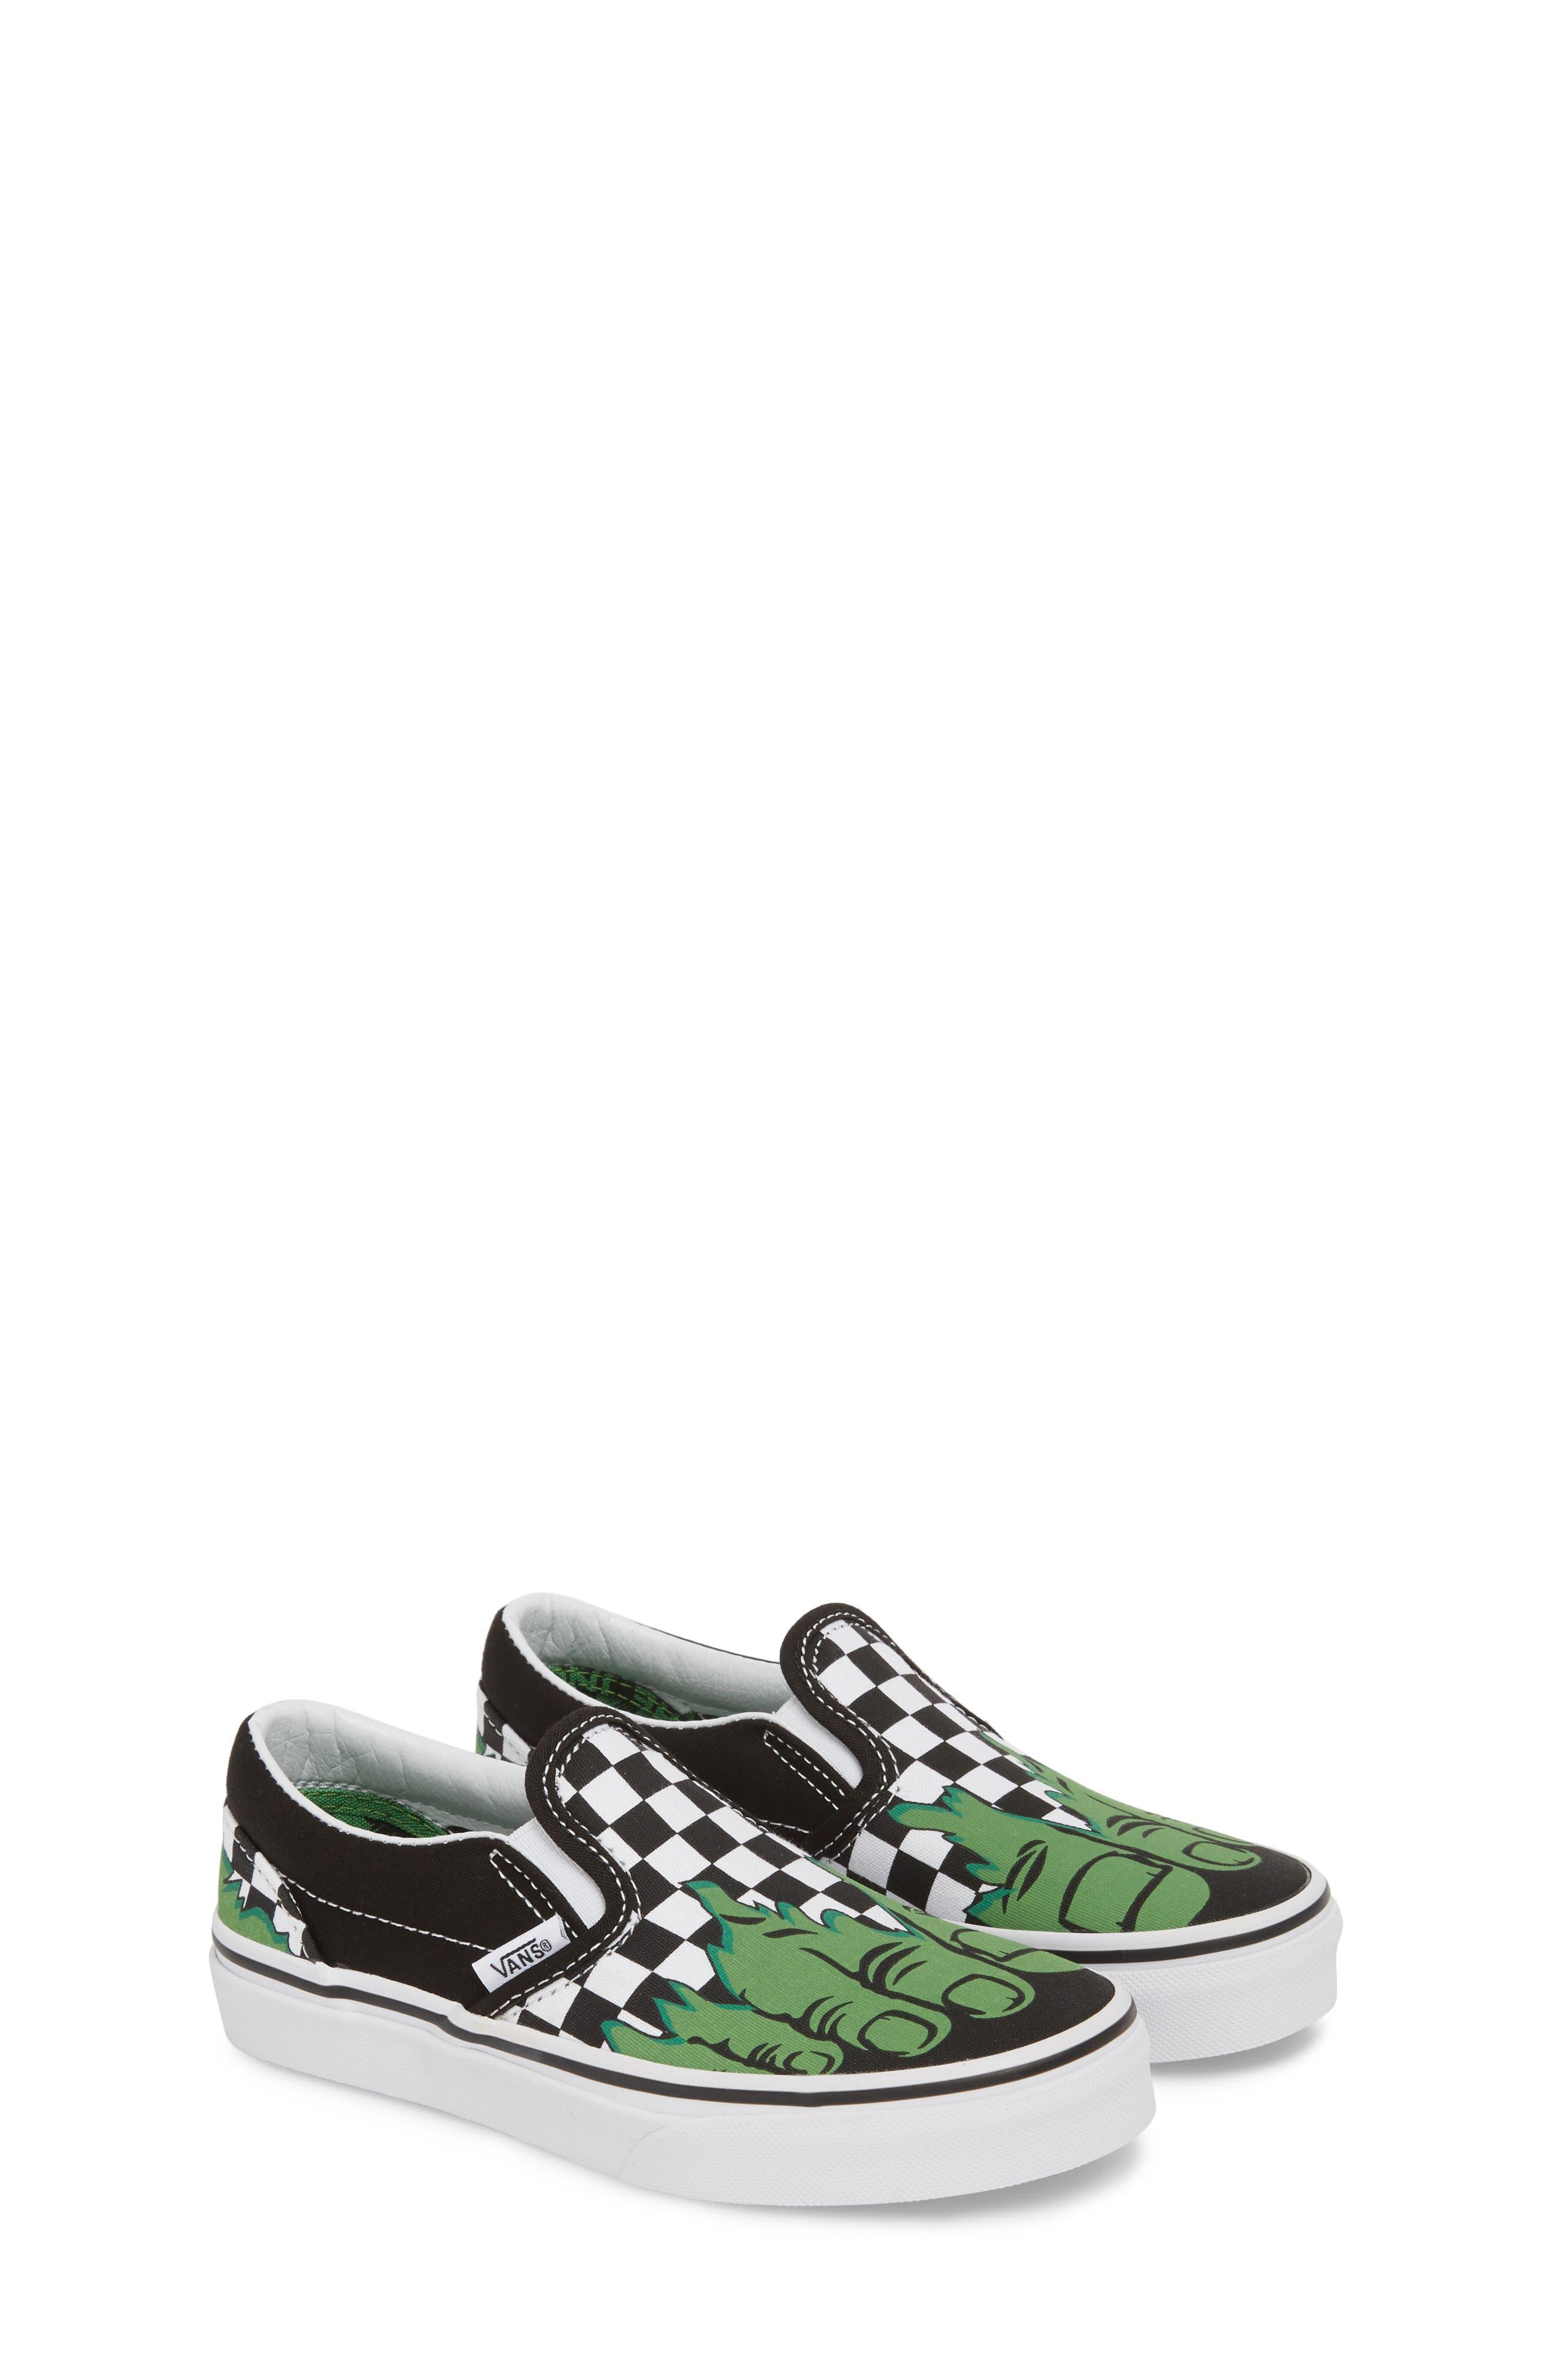 x Marvel<sup>®</sup> Hulk Checkerboard Slip-On Sneaker,                             Alternate thumbnail 2, color,                             310